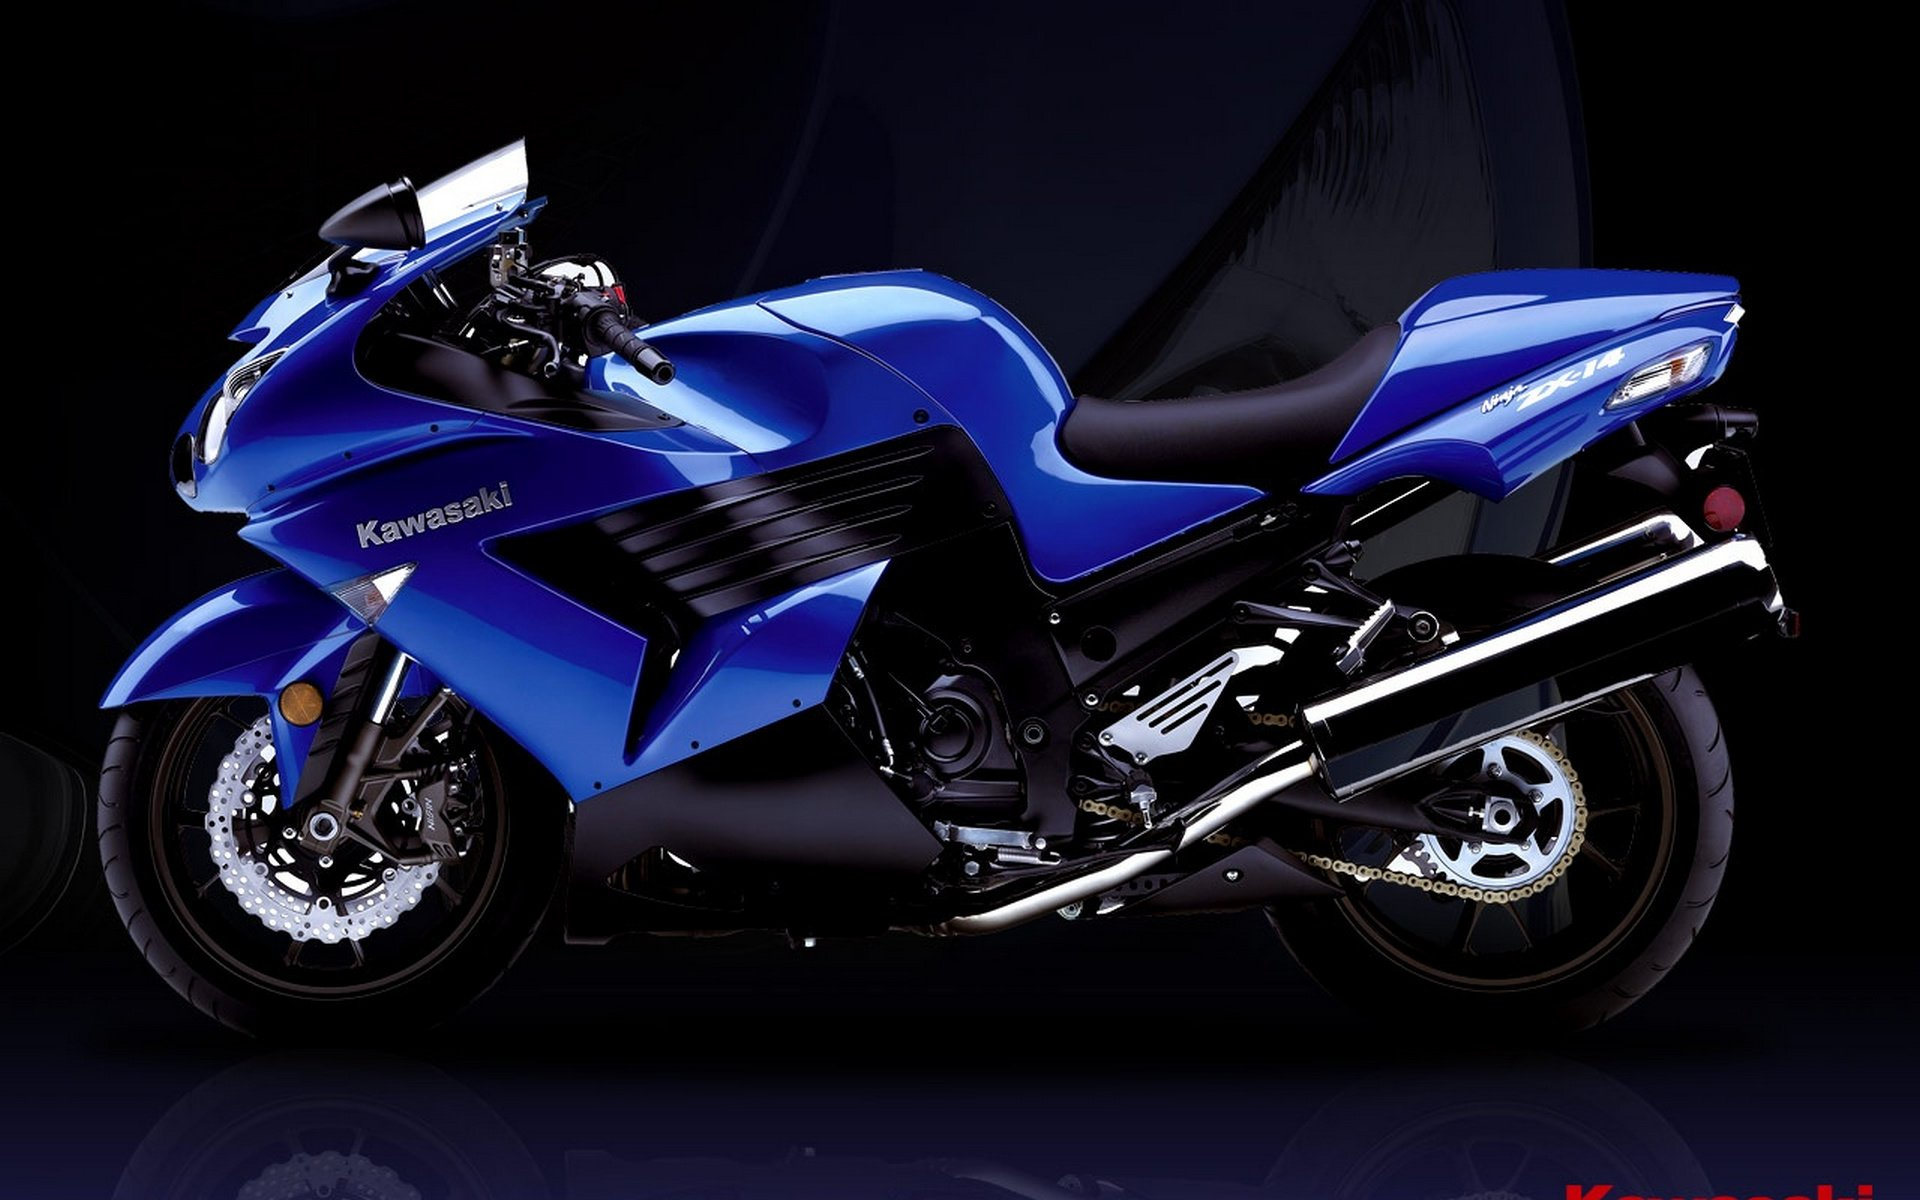 Kawasaki HD Wallpaper | Background Image | 1920x1200 | ID ...